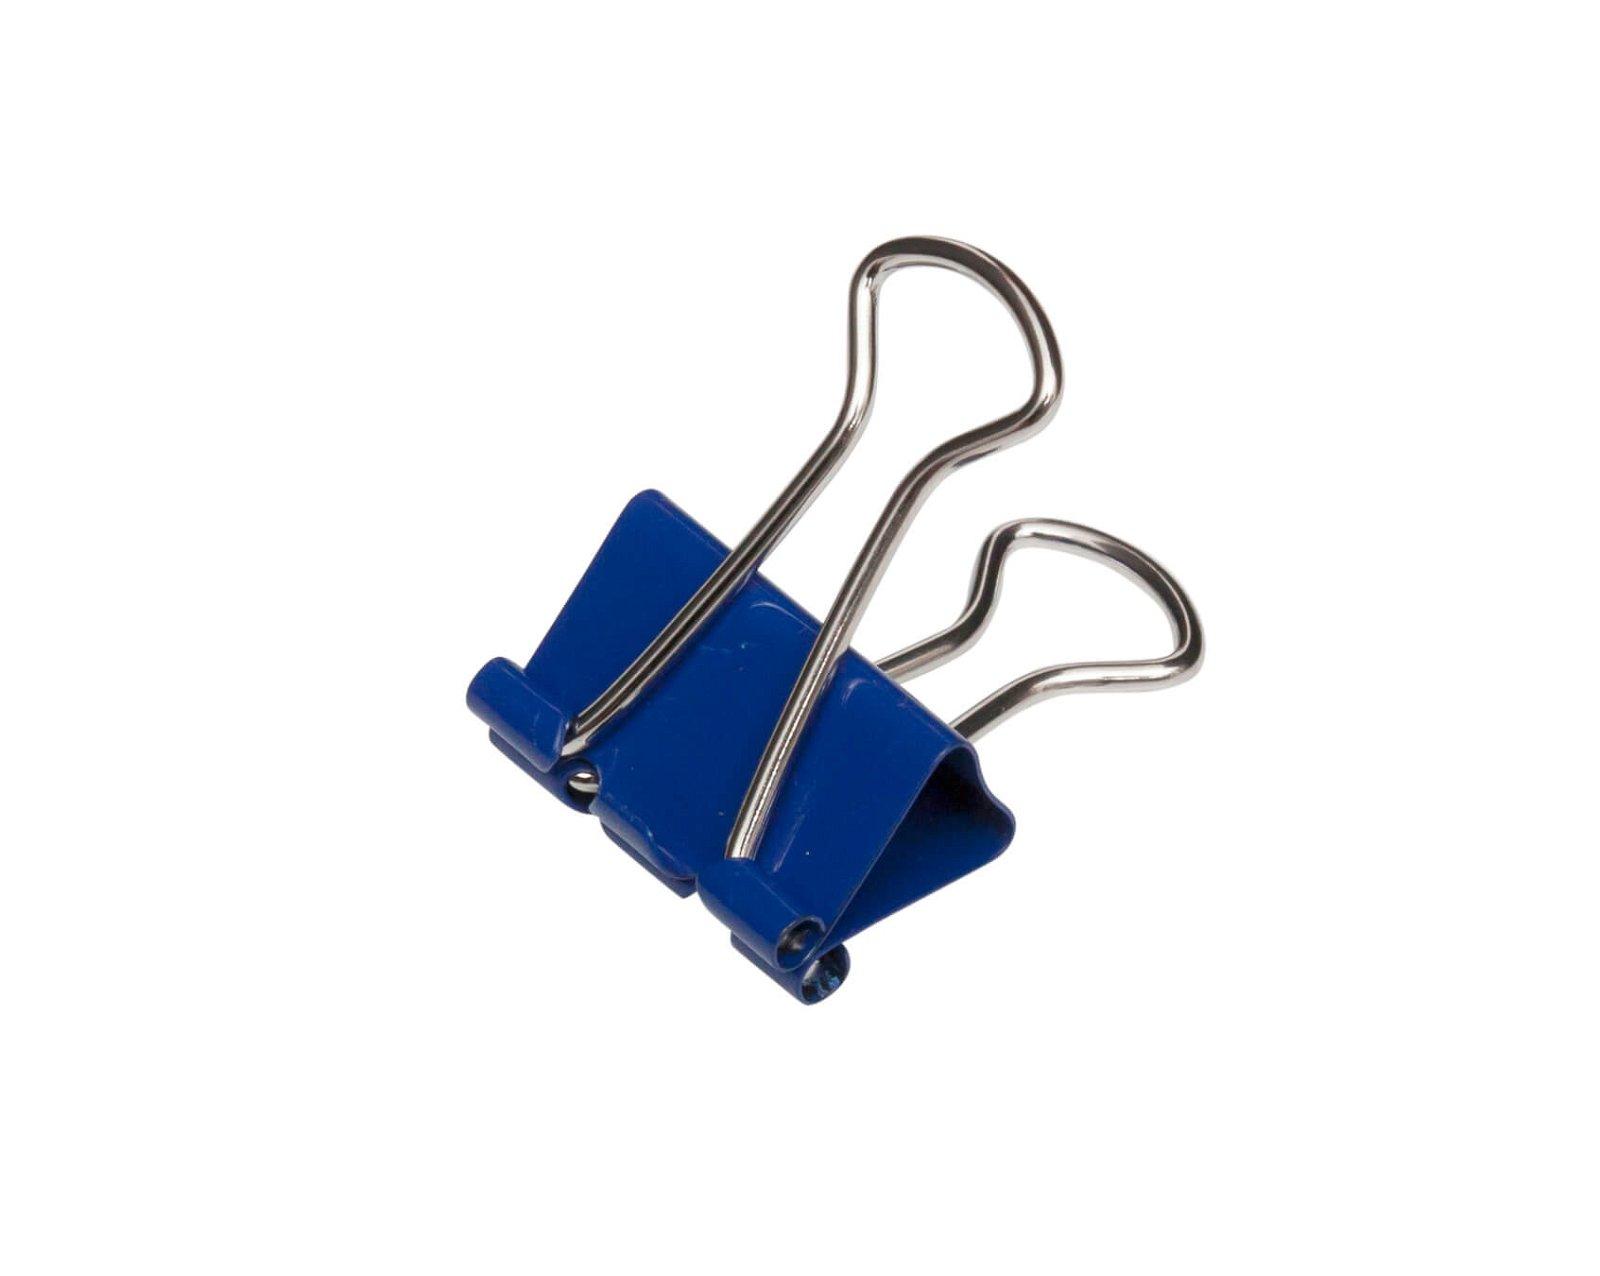 mauly 214, Breite 19 mm, 12 St./Ktn., blau